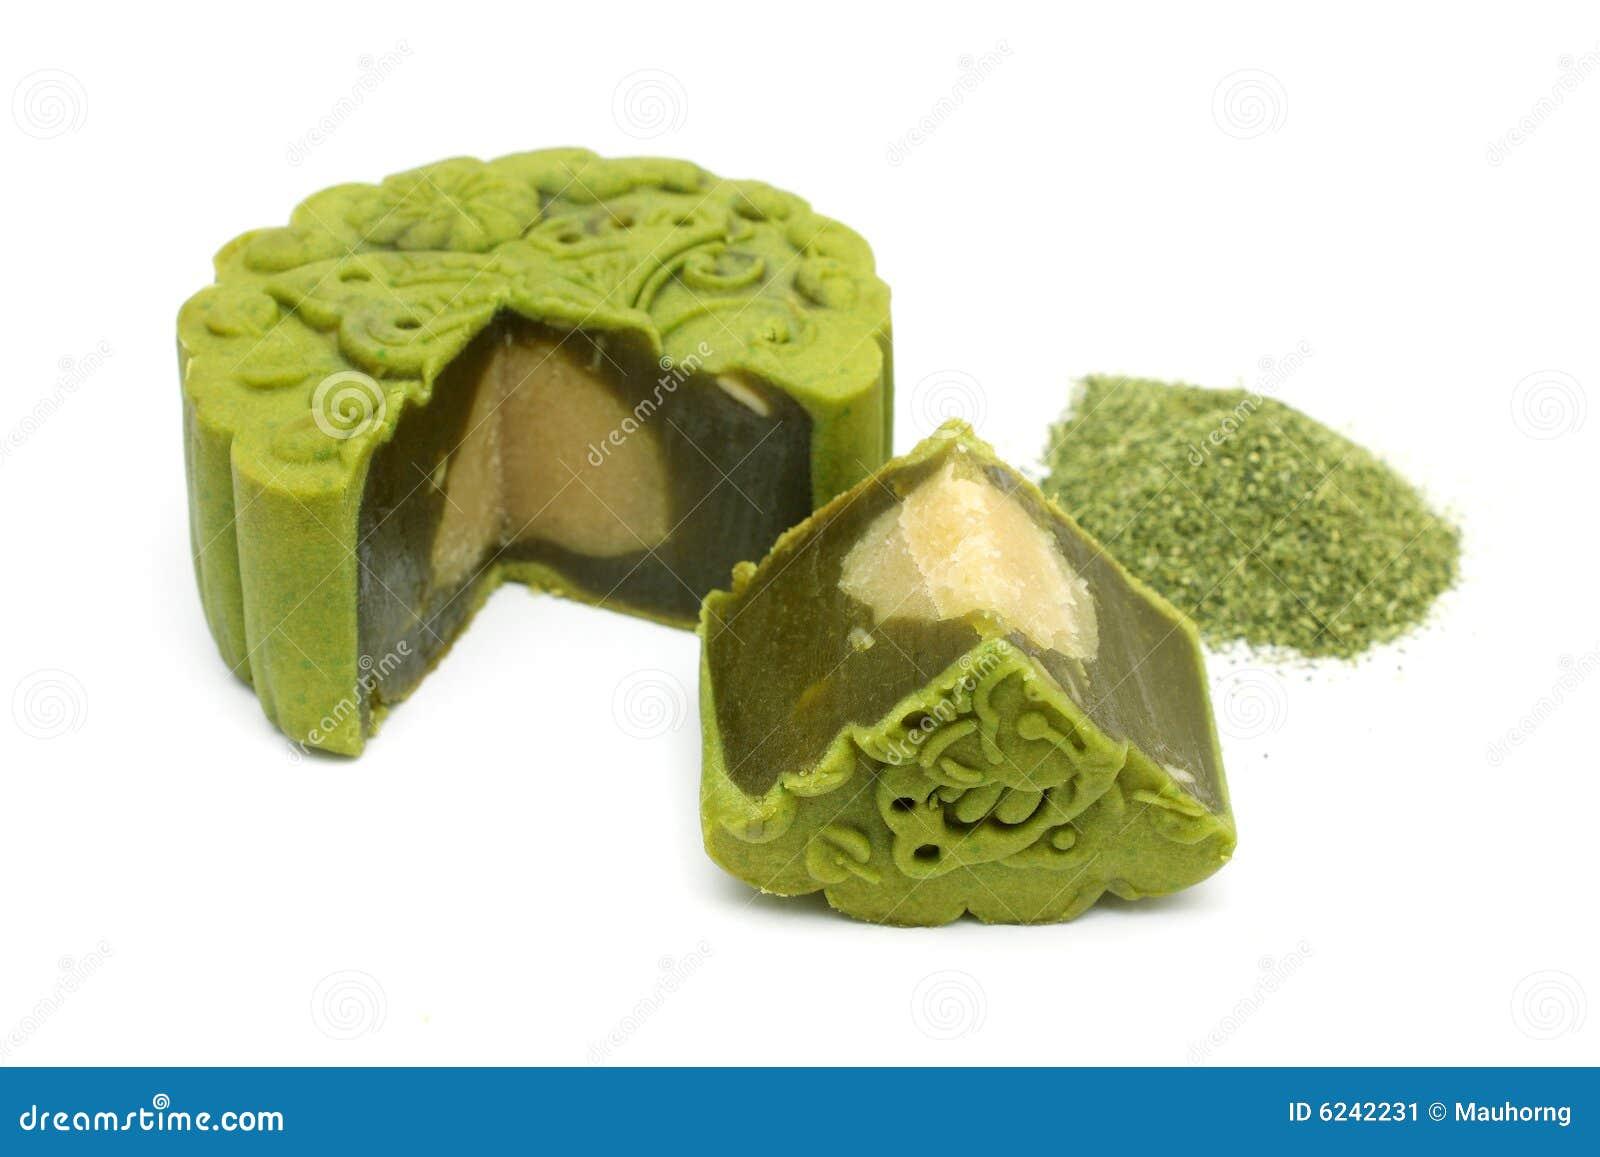 Pin Green Tea Chocolate Mousse Cake On White Stock Photo 21276394 Cake ...